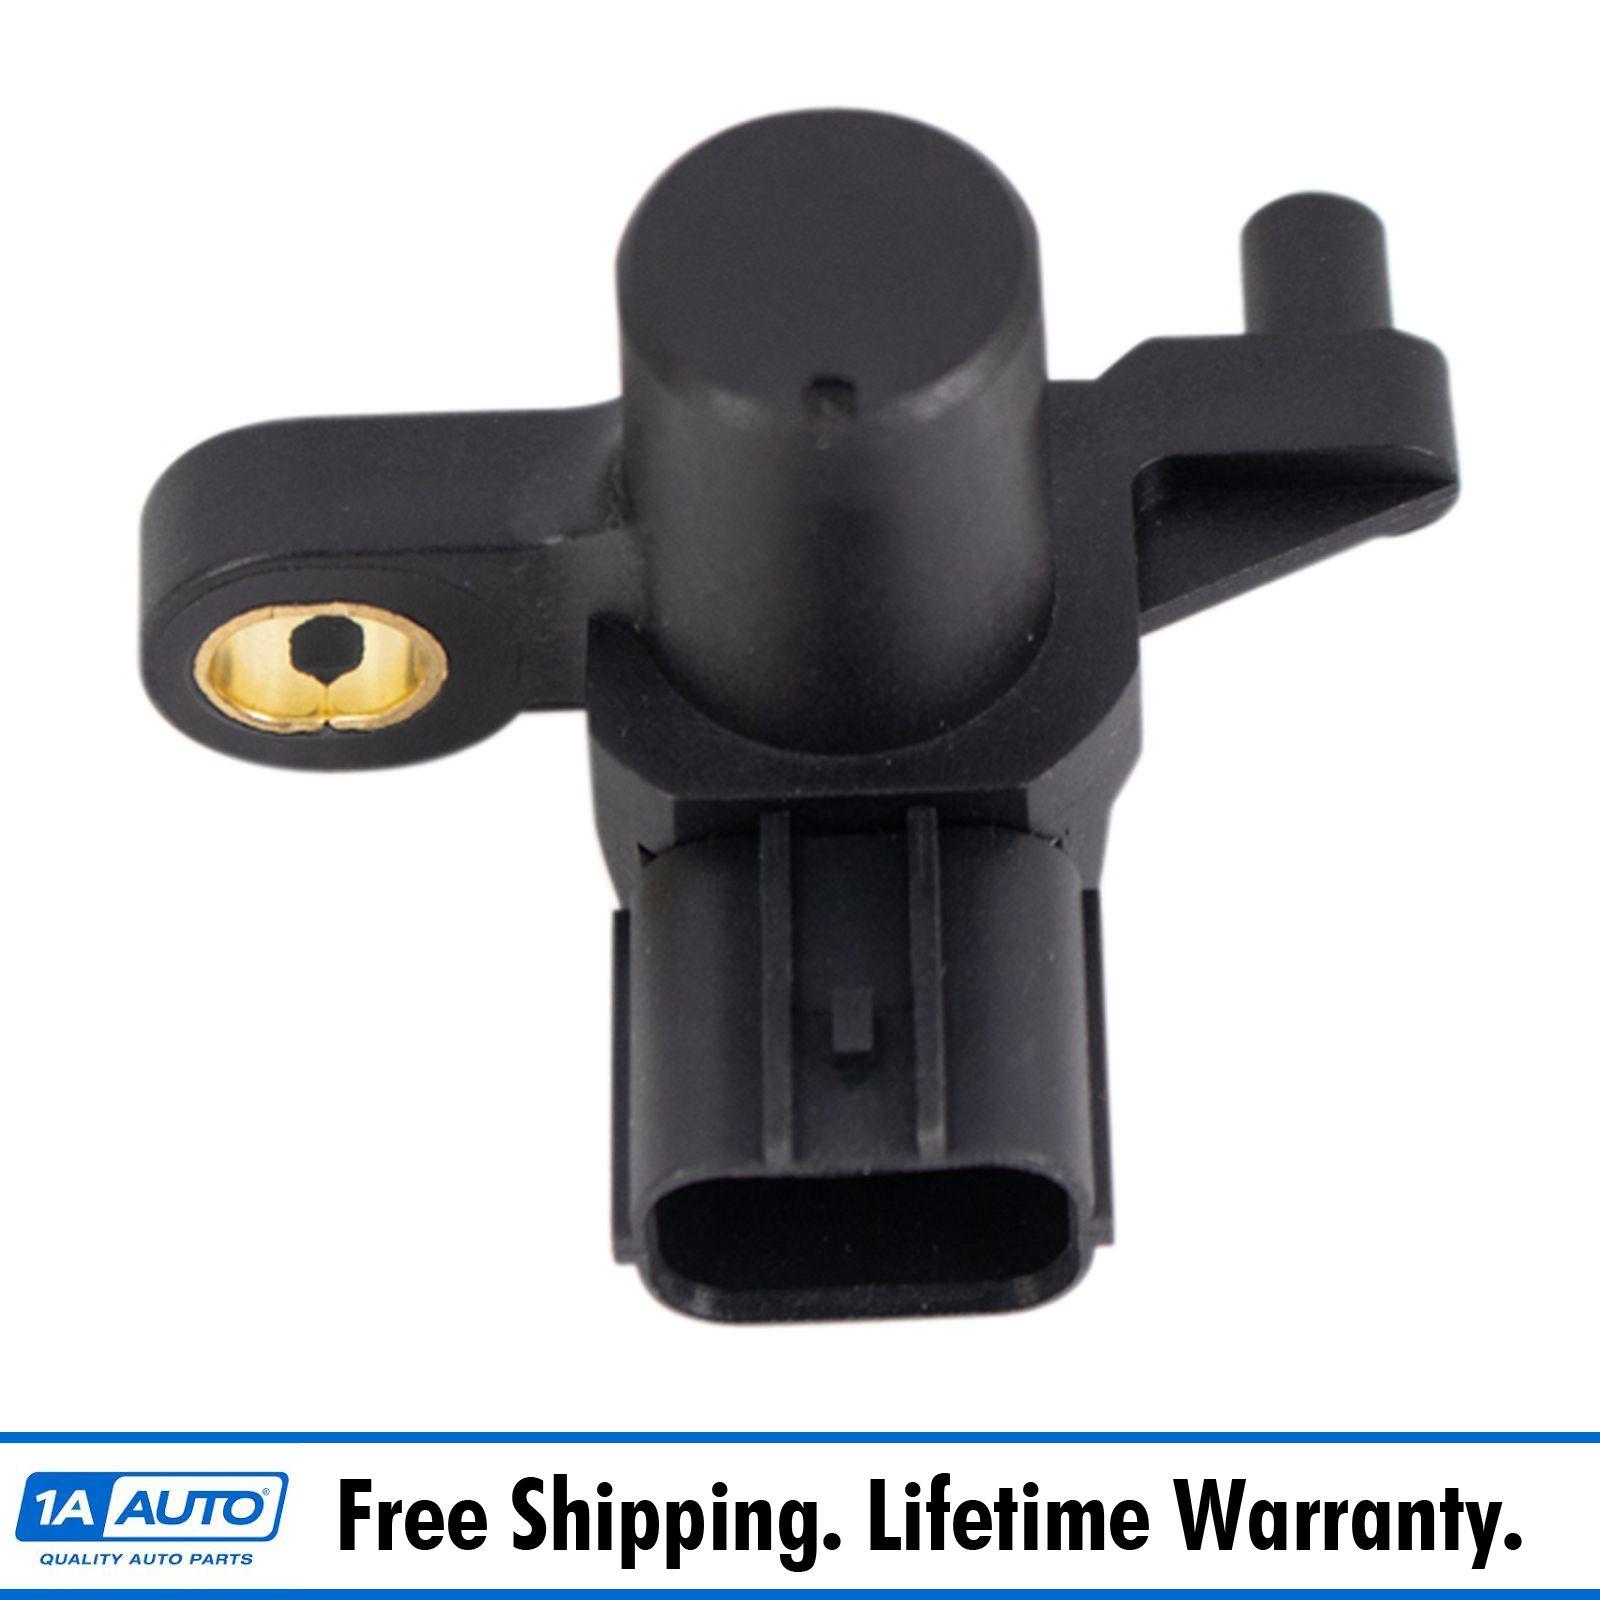 Camshaft Position Sensor for 01-05 Honda Civic 1.7L